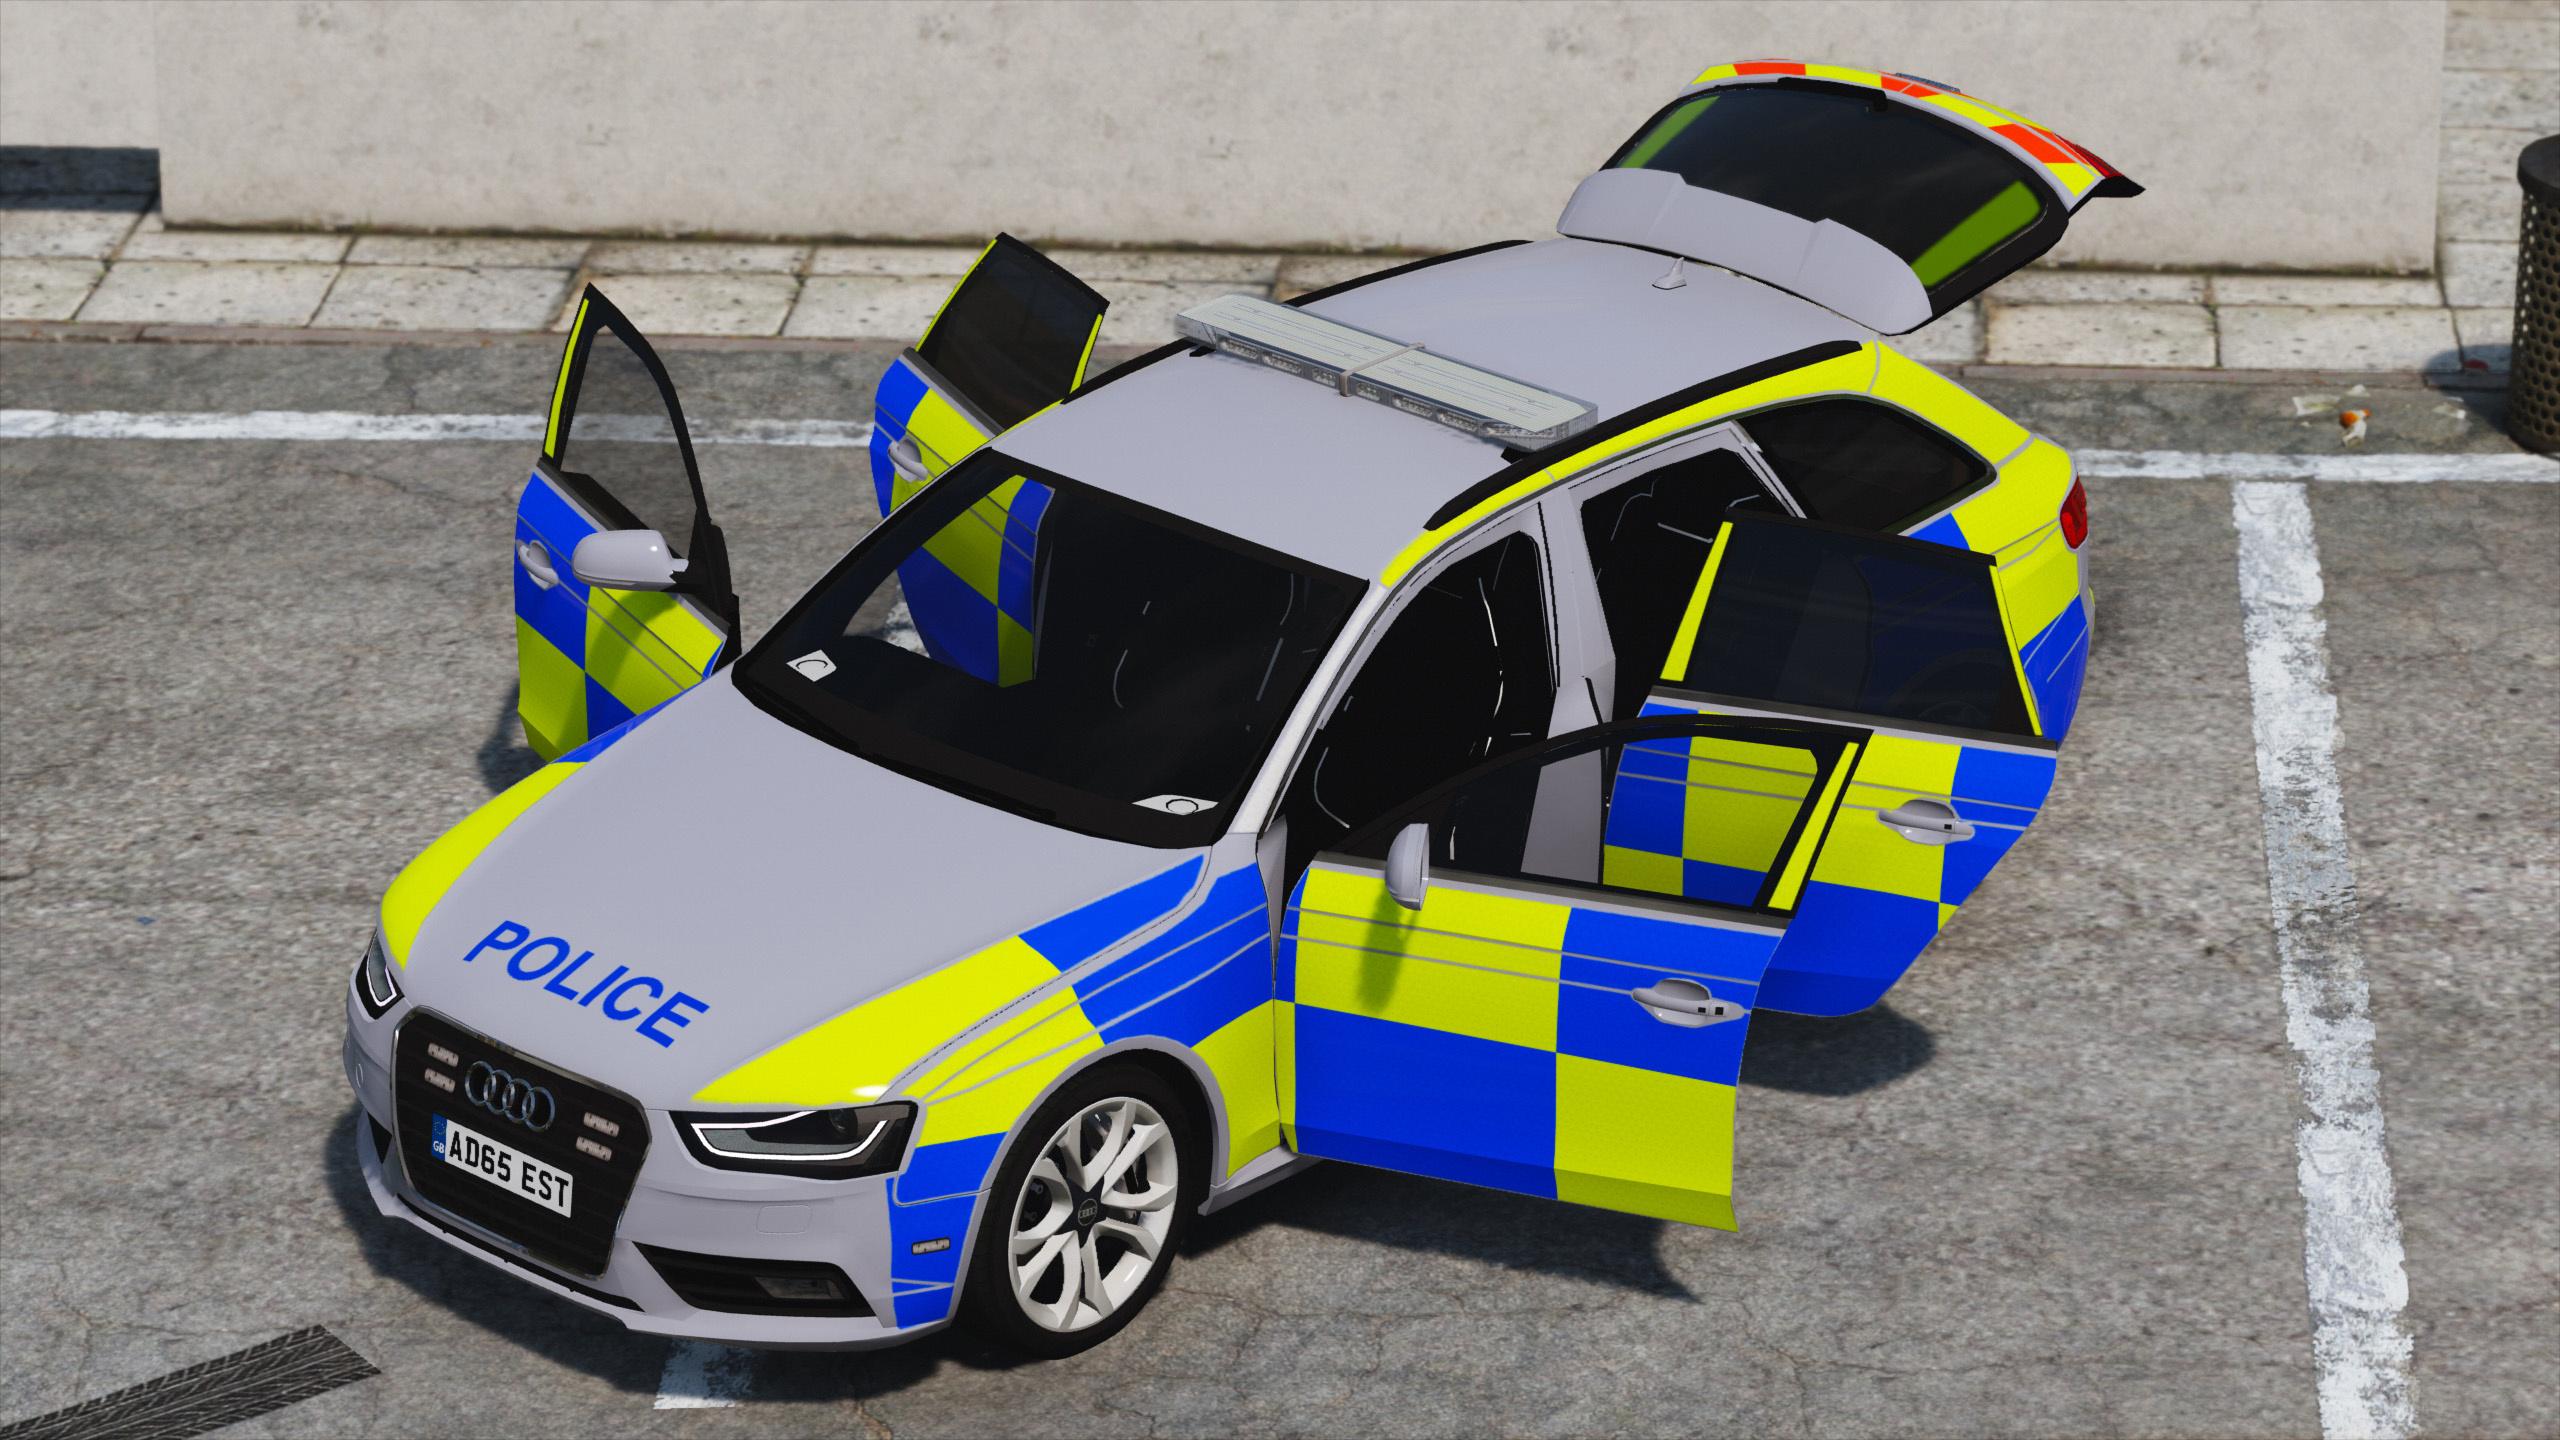 2013 British Police Audi A4 S4 Avant Gta5 Mods Com